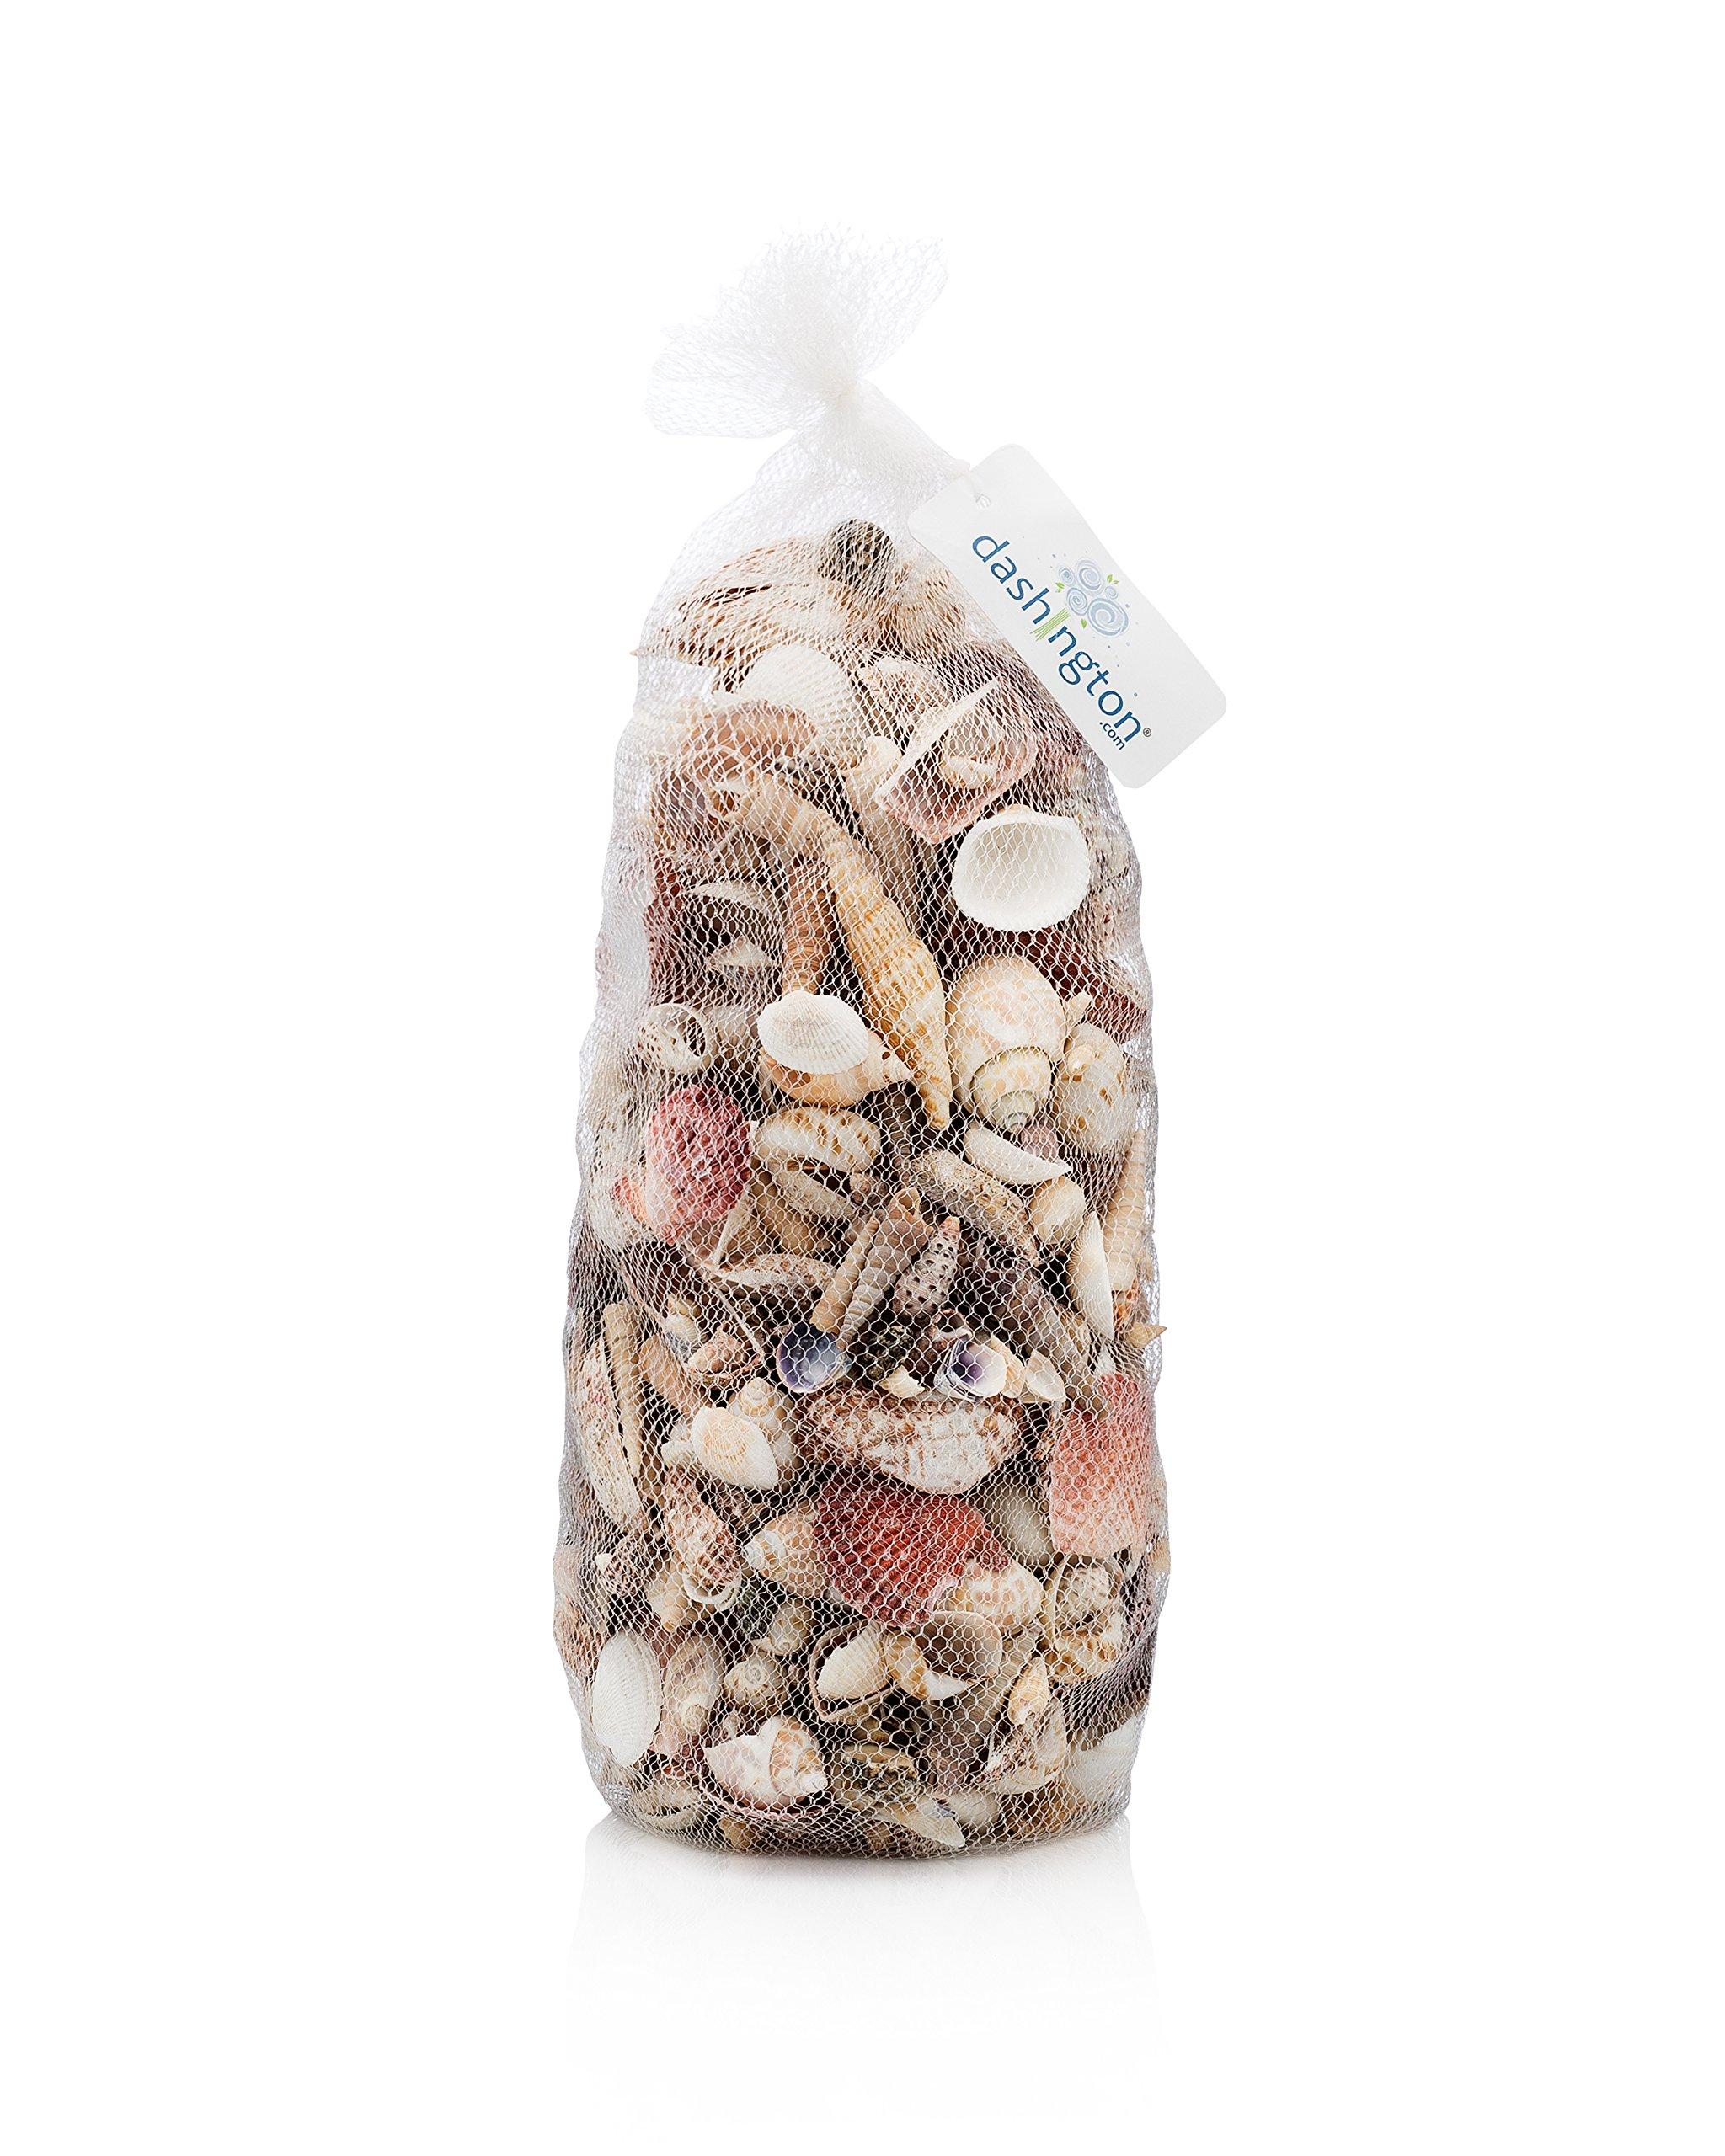 Dashington Assorted Beach Sea Shells, Large Sizes 1''-2'', 5lb Bag (400-500 Shells) by Dashington